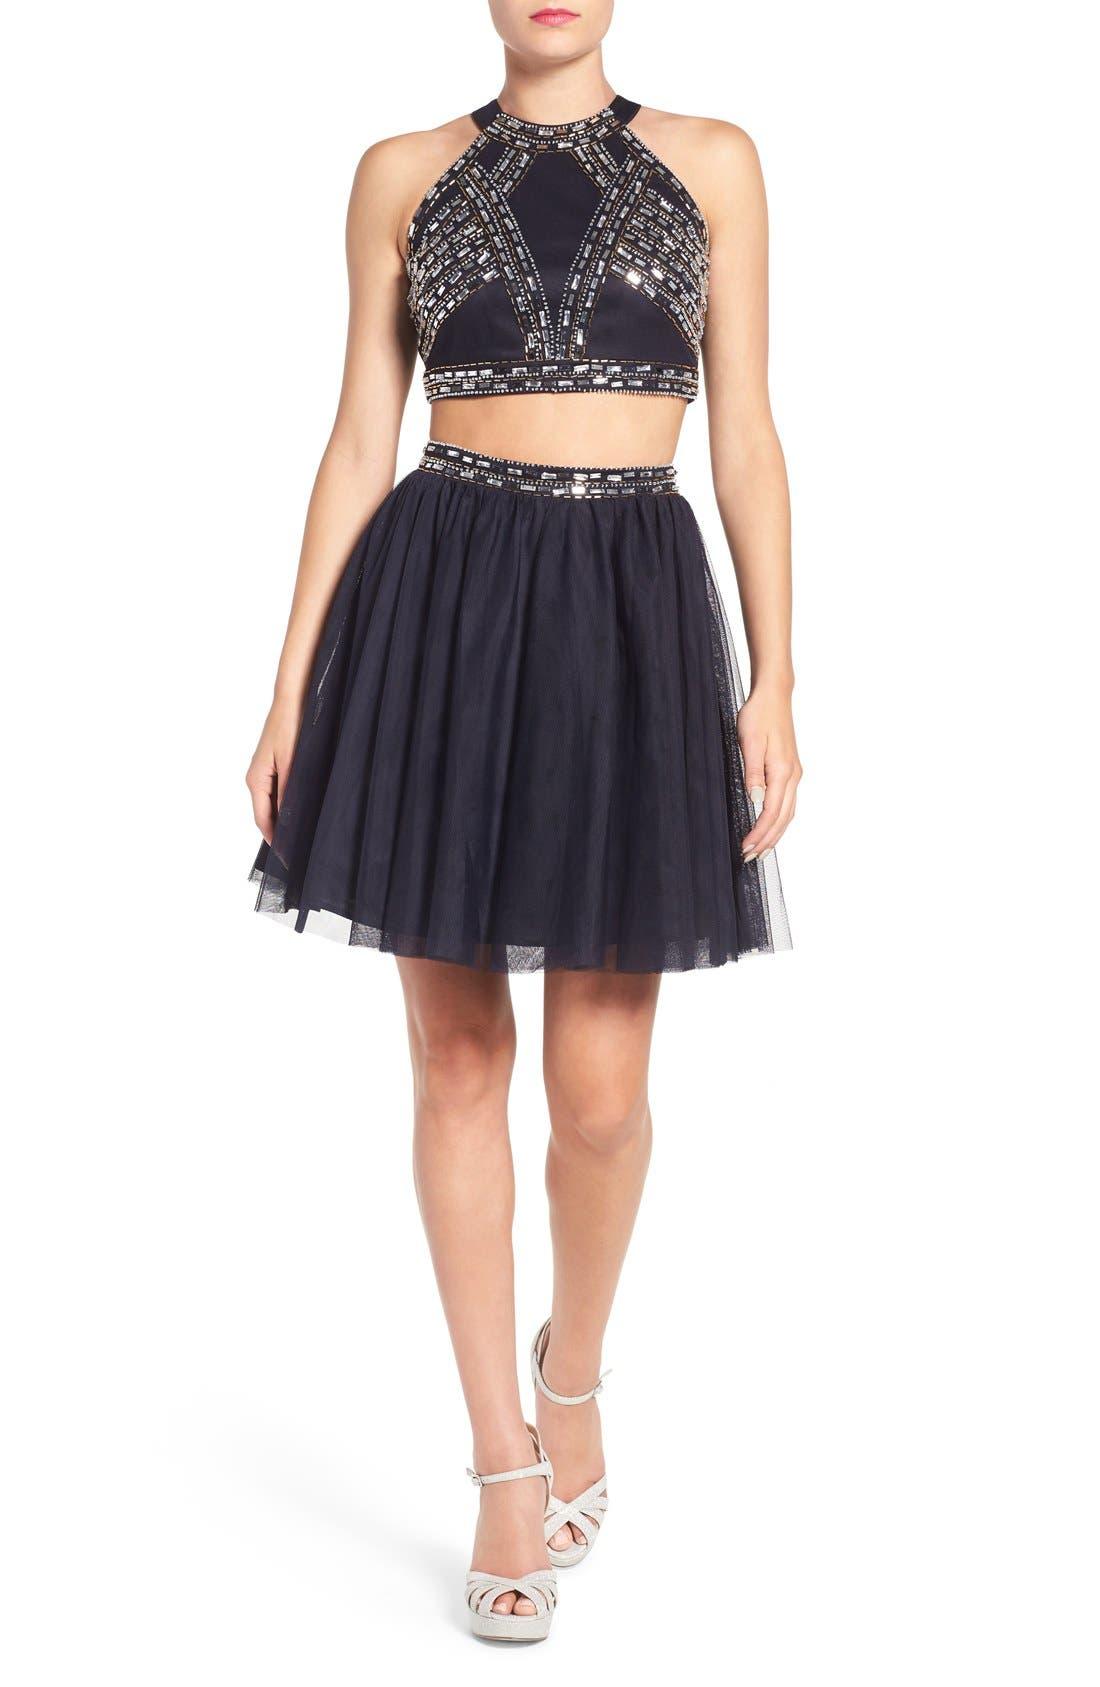 Alternate Image 1 Selected - Blondie Nites Embellished Two-Piece Skater Dress